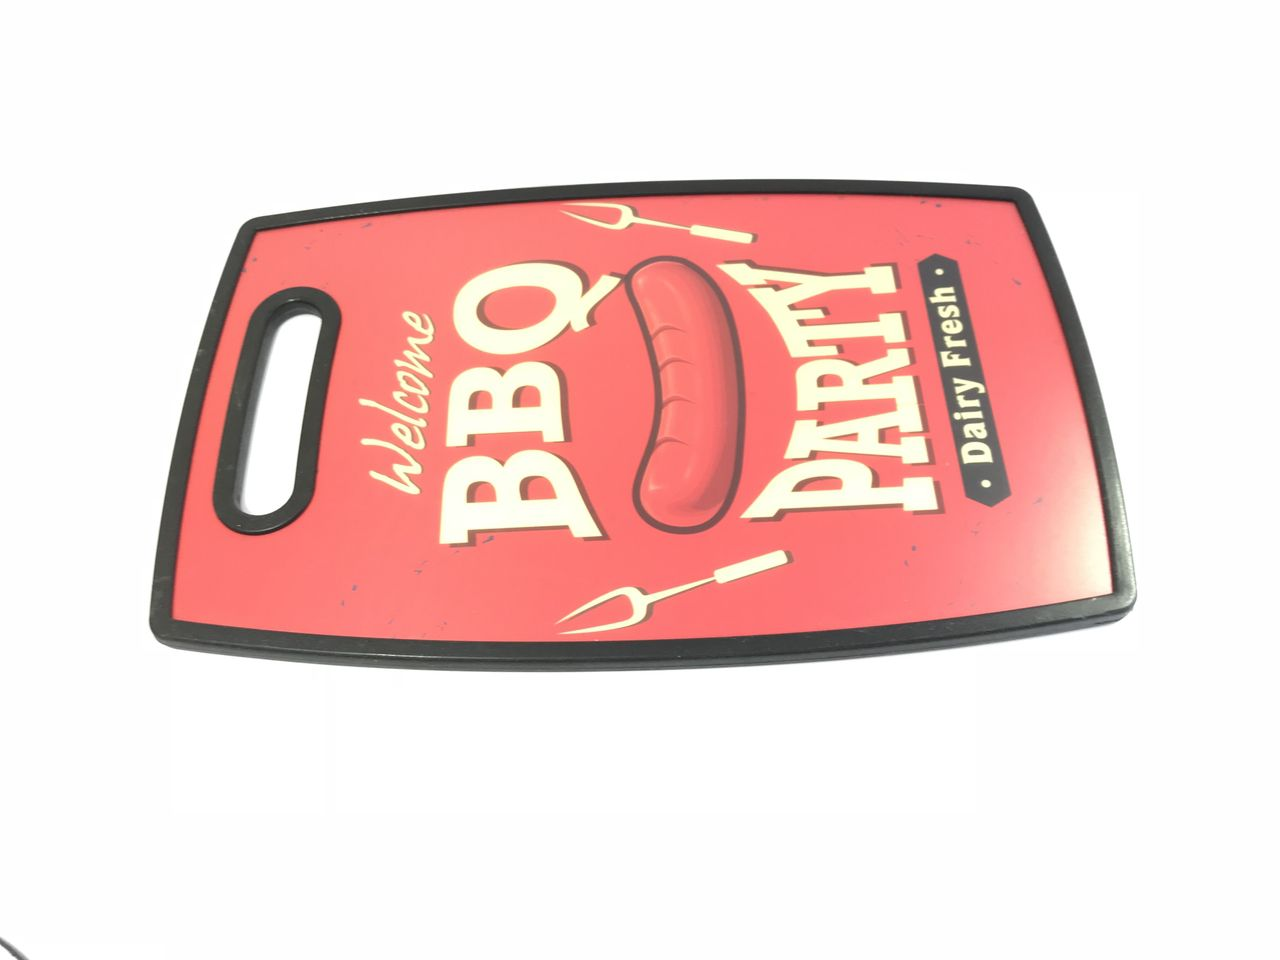 Tábua de Corte BBQ de Plástico 37X23X1.1 CM